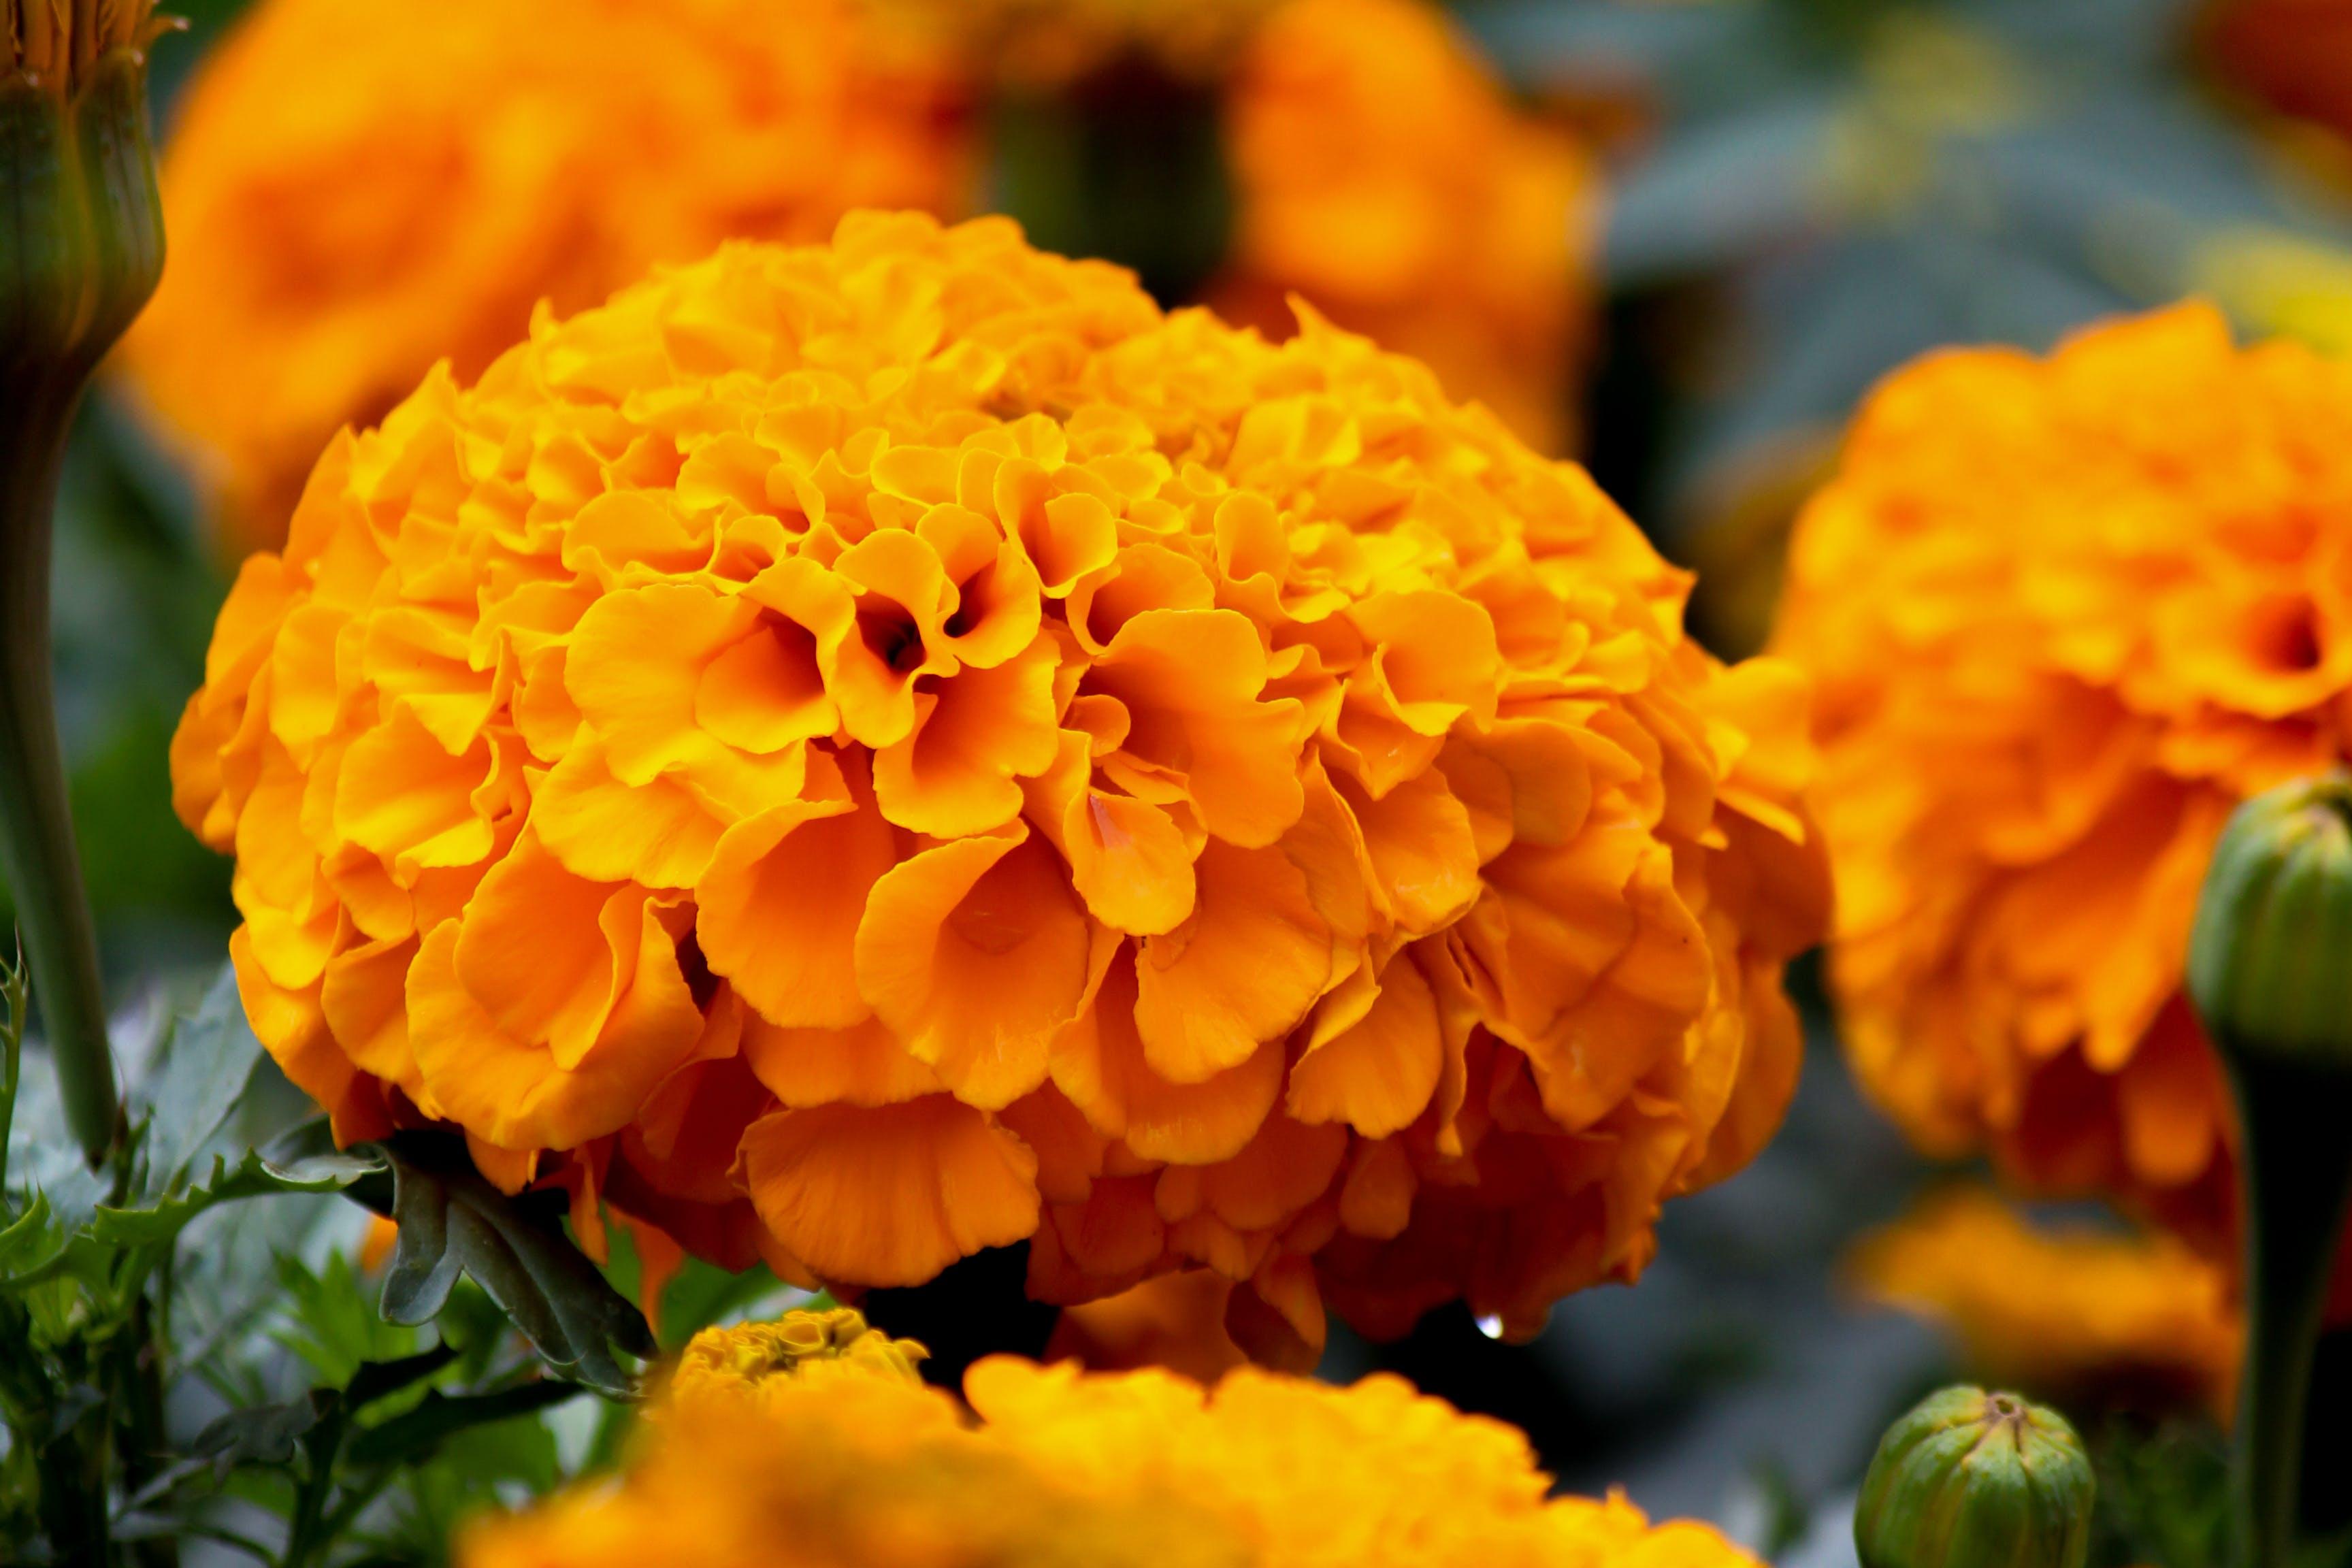 Free stock photo of nature, yellow, photography, orange